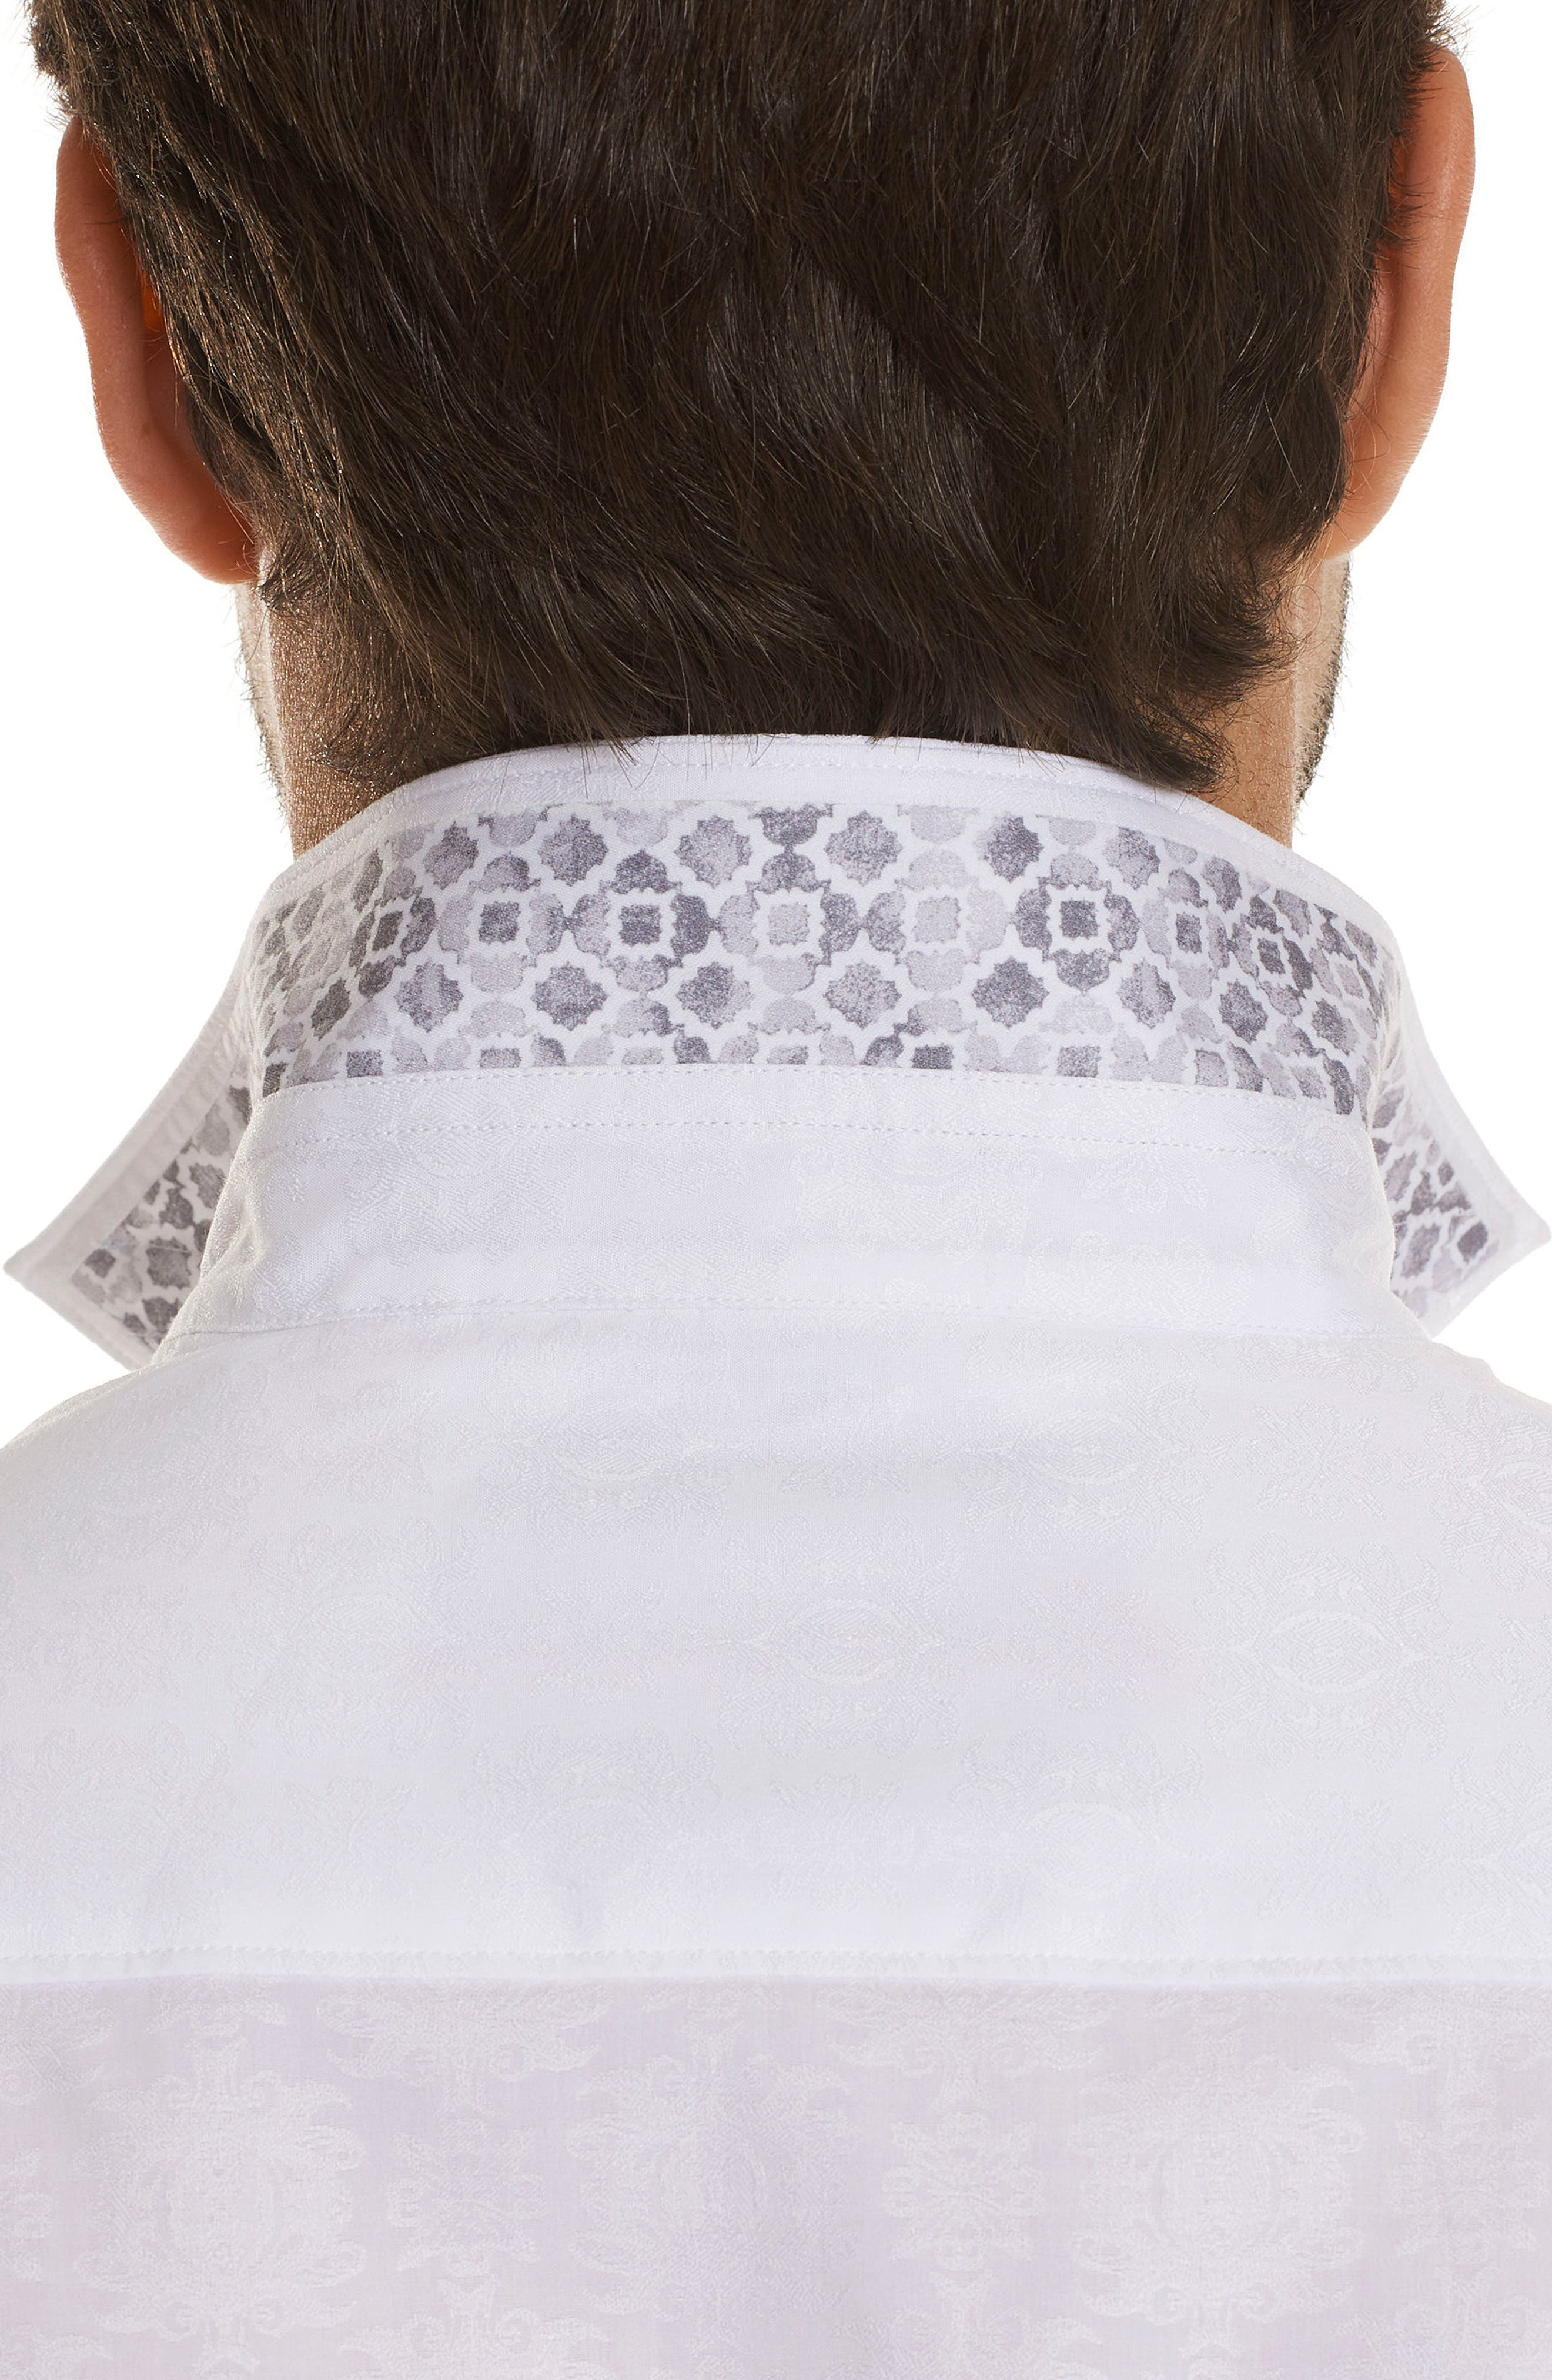 Cullen Squared Regular Fit Short Sleeve Sport Shirt,                             Alternate thumbnail 3, color,                             100